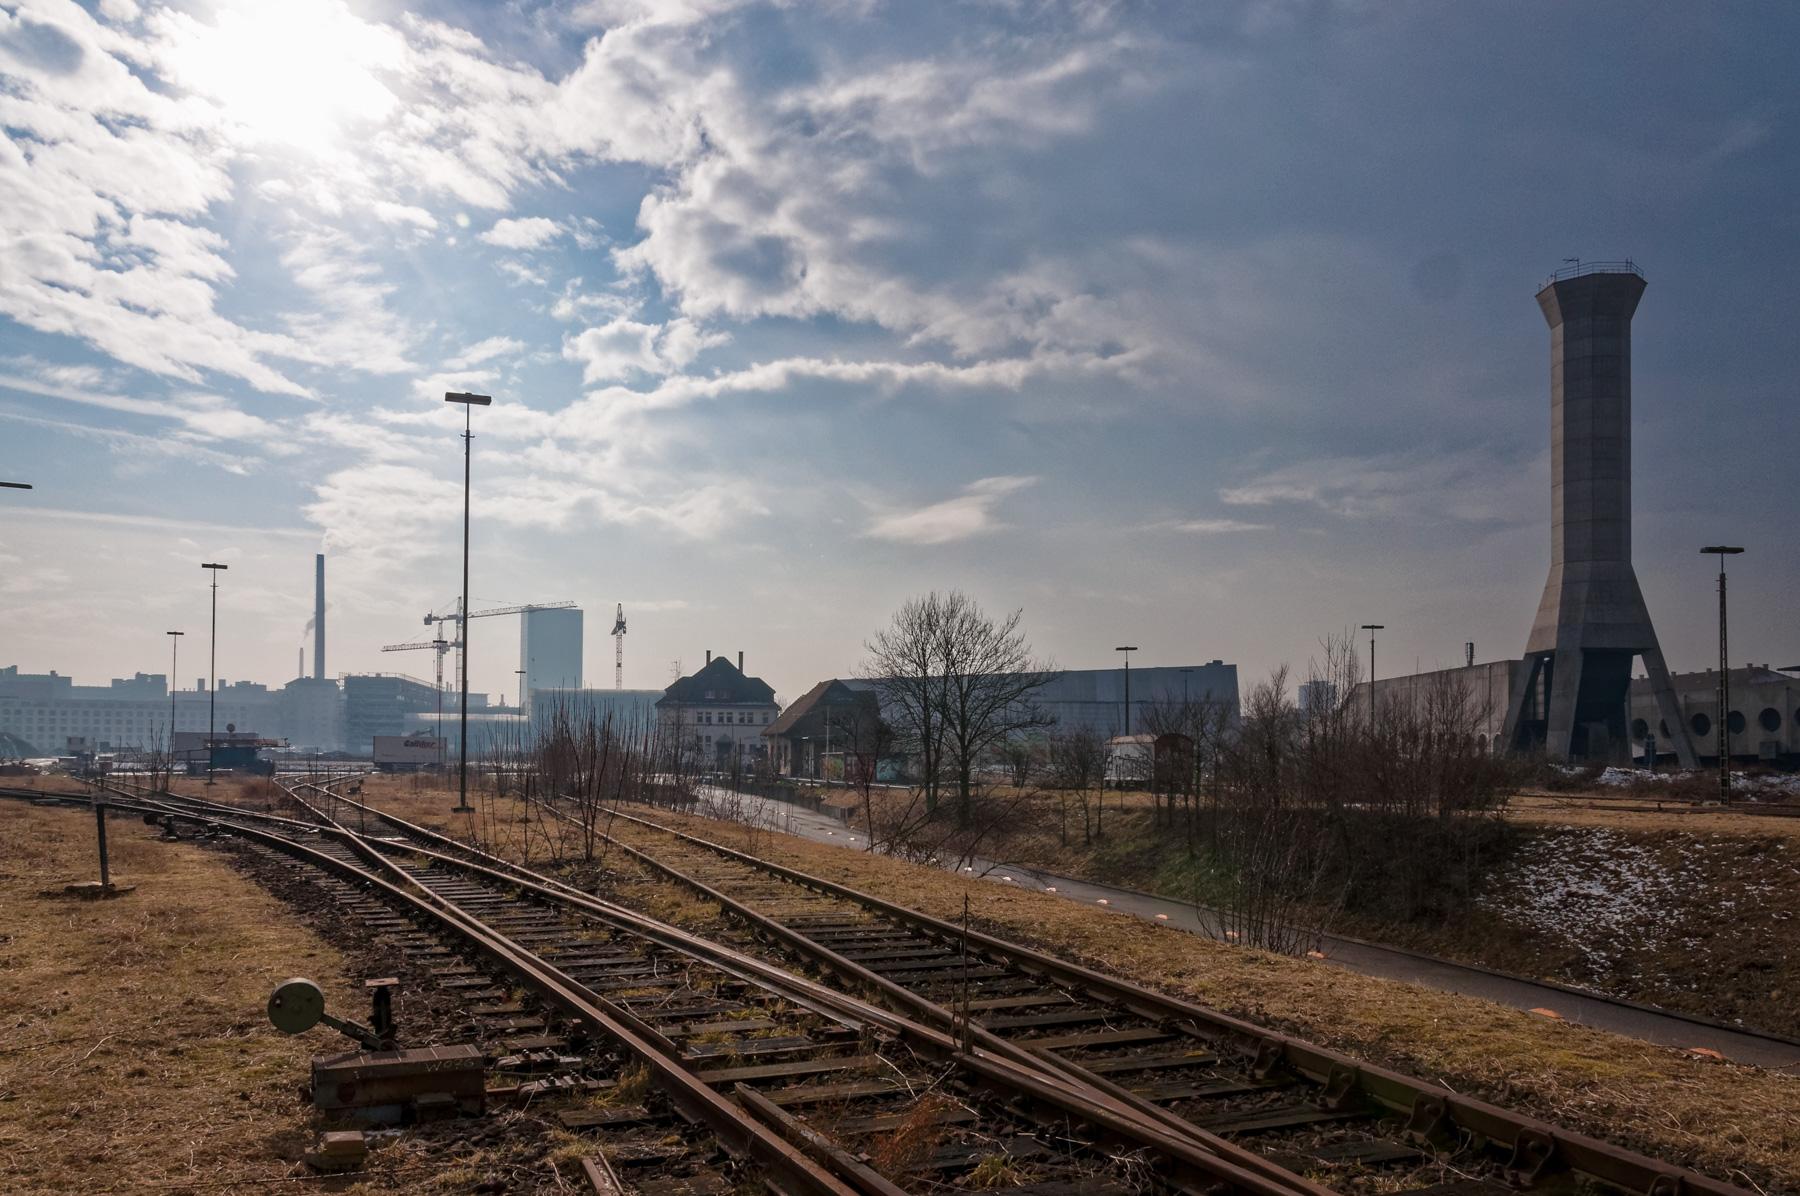 Street_RailsnSun